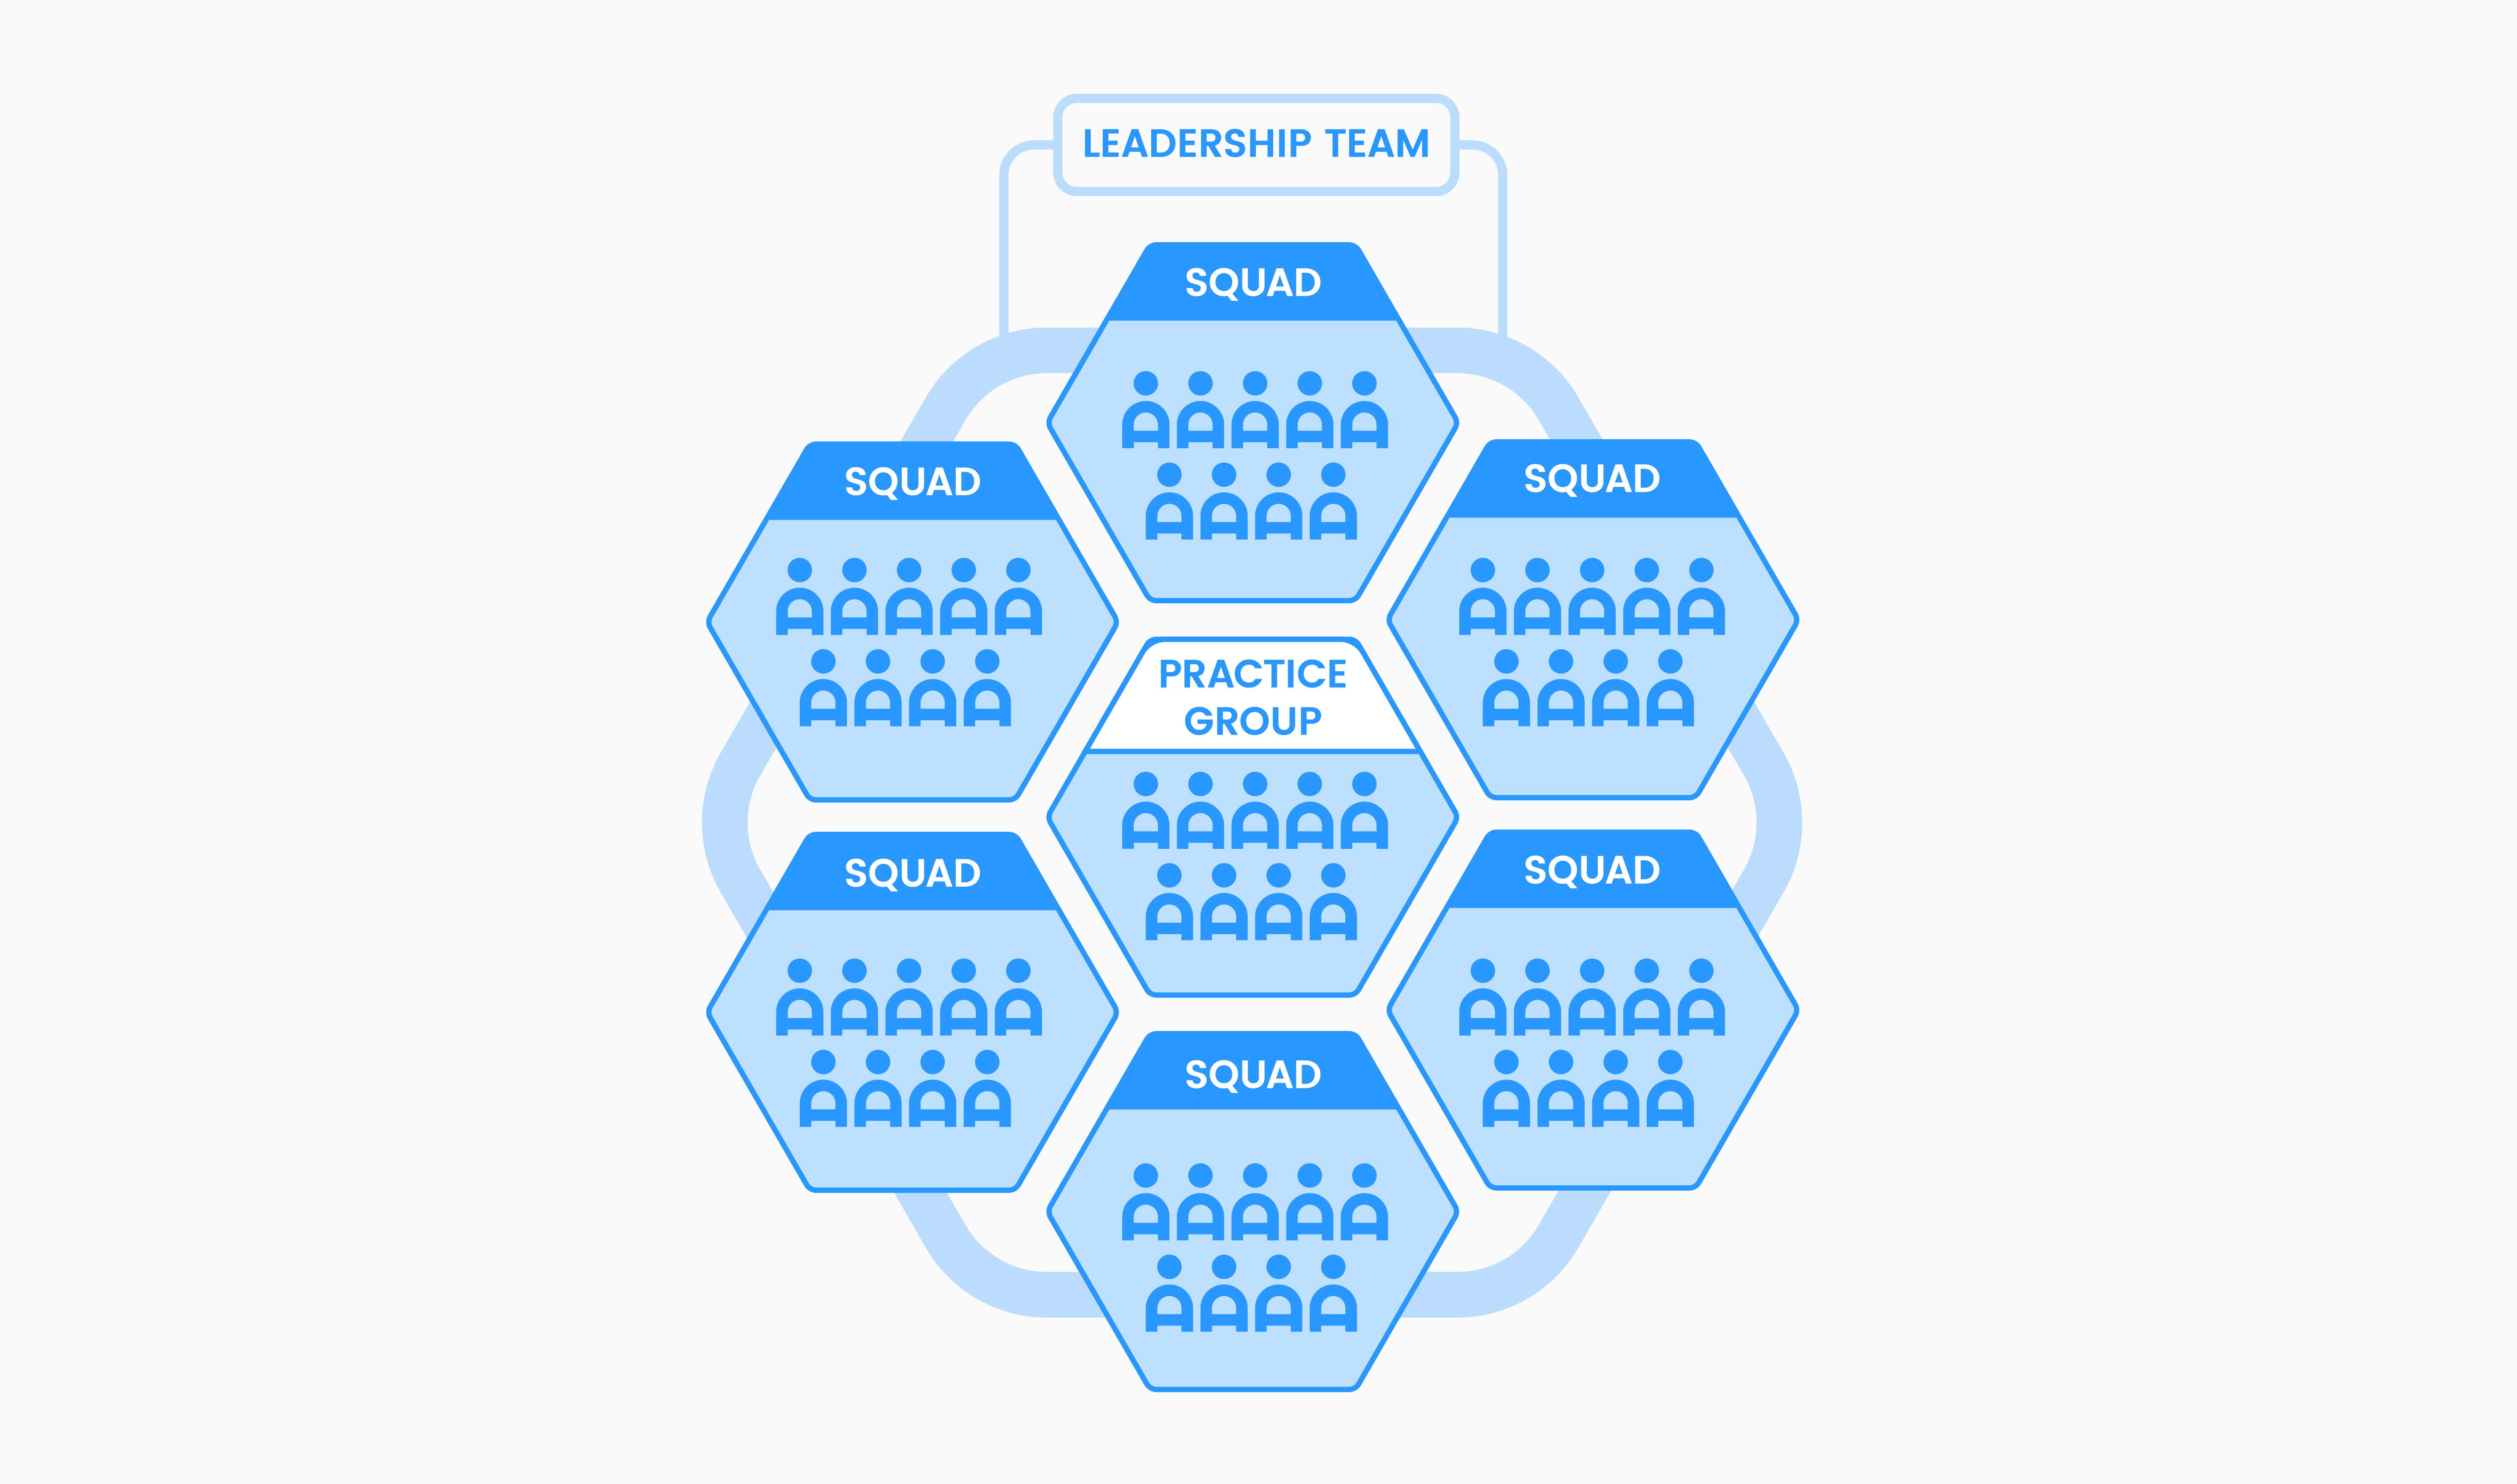 Company structure diagram_Club-03-2